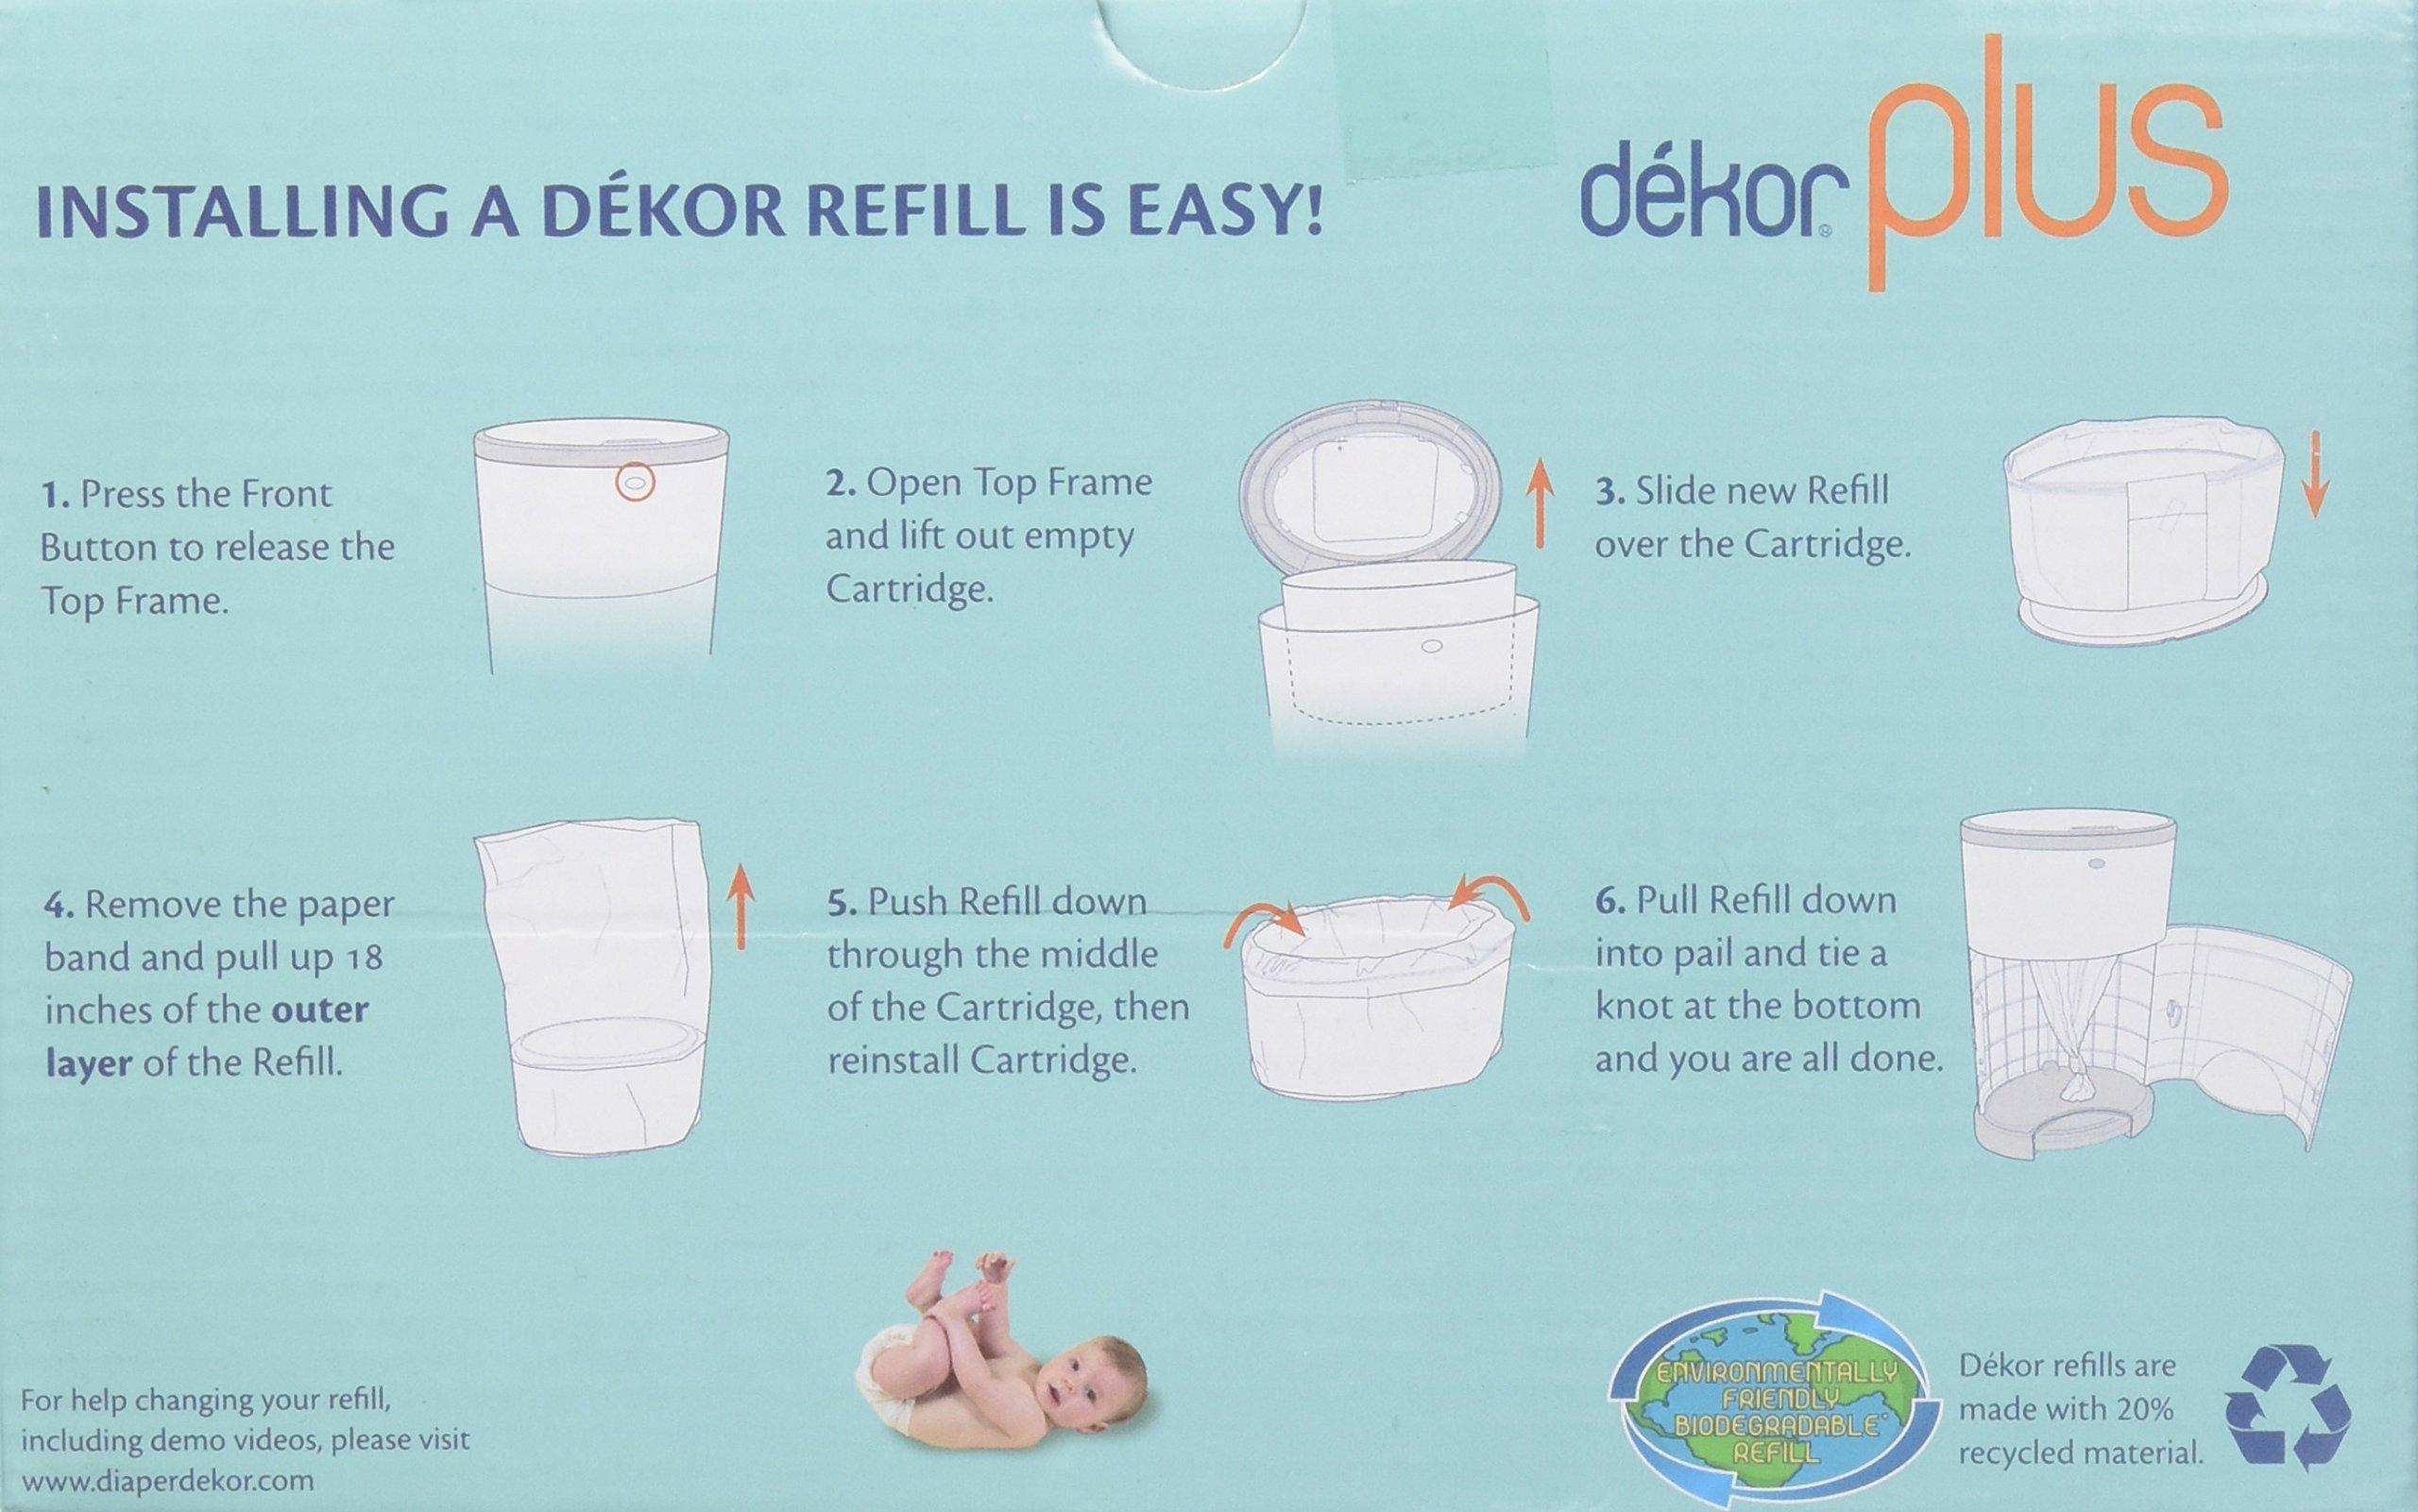 Galleon diaper dekor plus diaper pail liner refills for Dekor mini refill